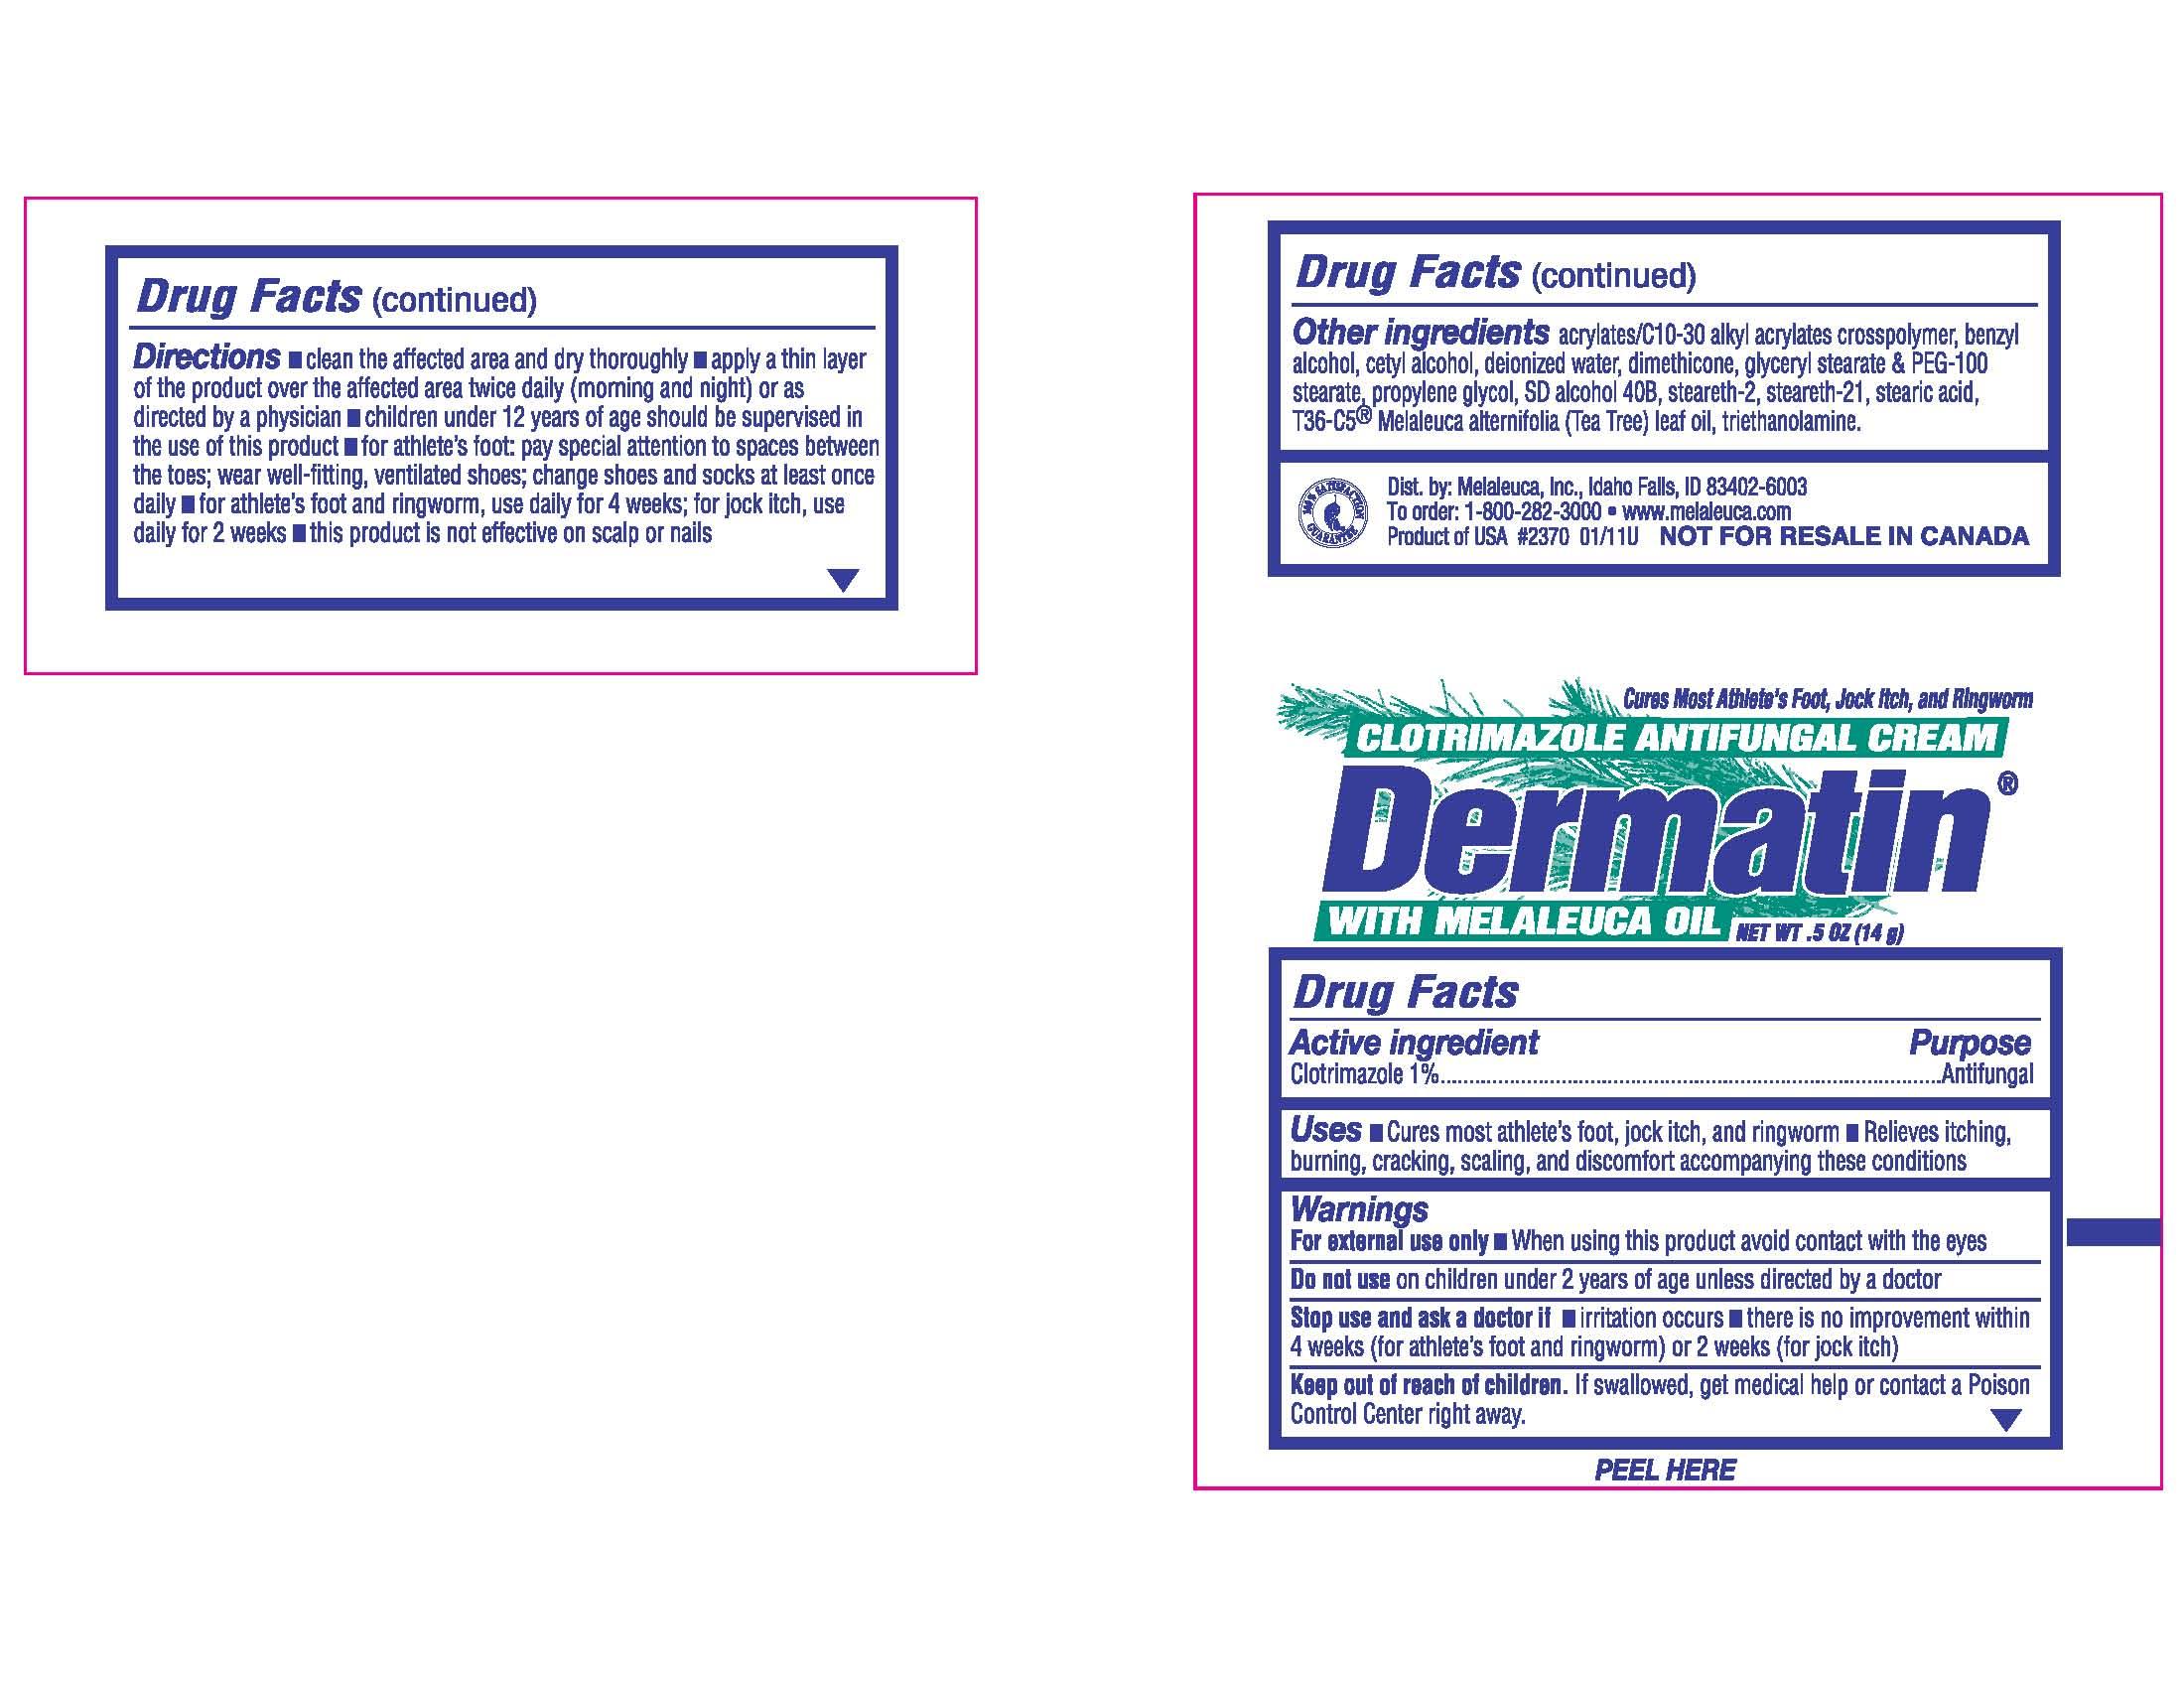 Dermatin Antifungal (Clotrimazole) Cream [Melaleuca, Inc.]